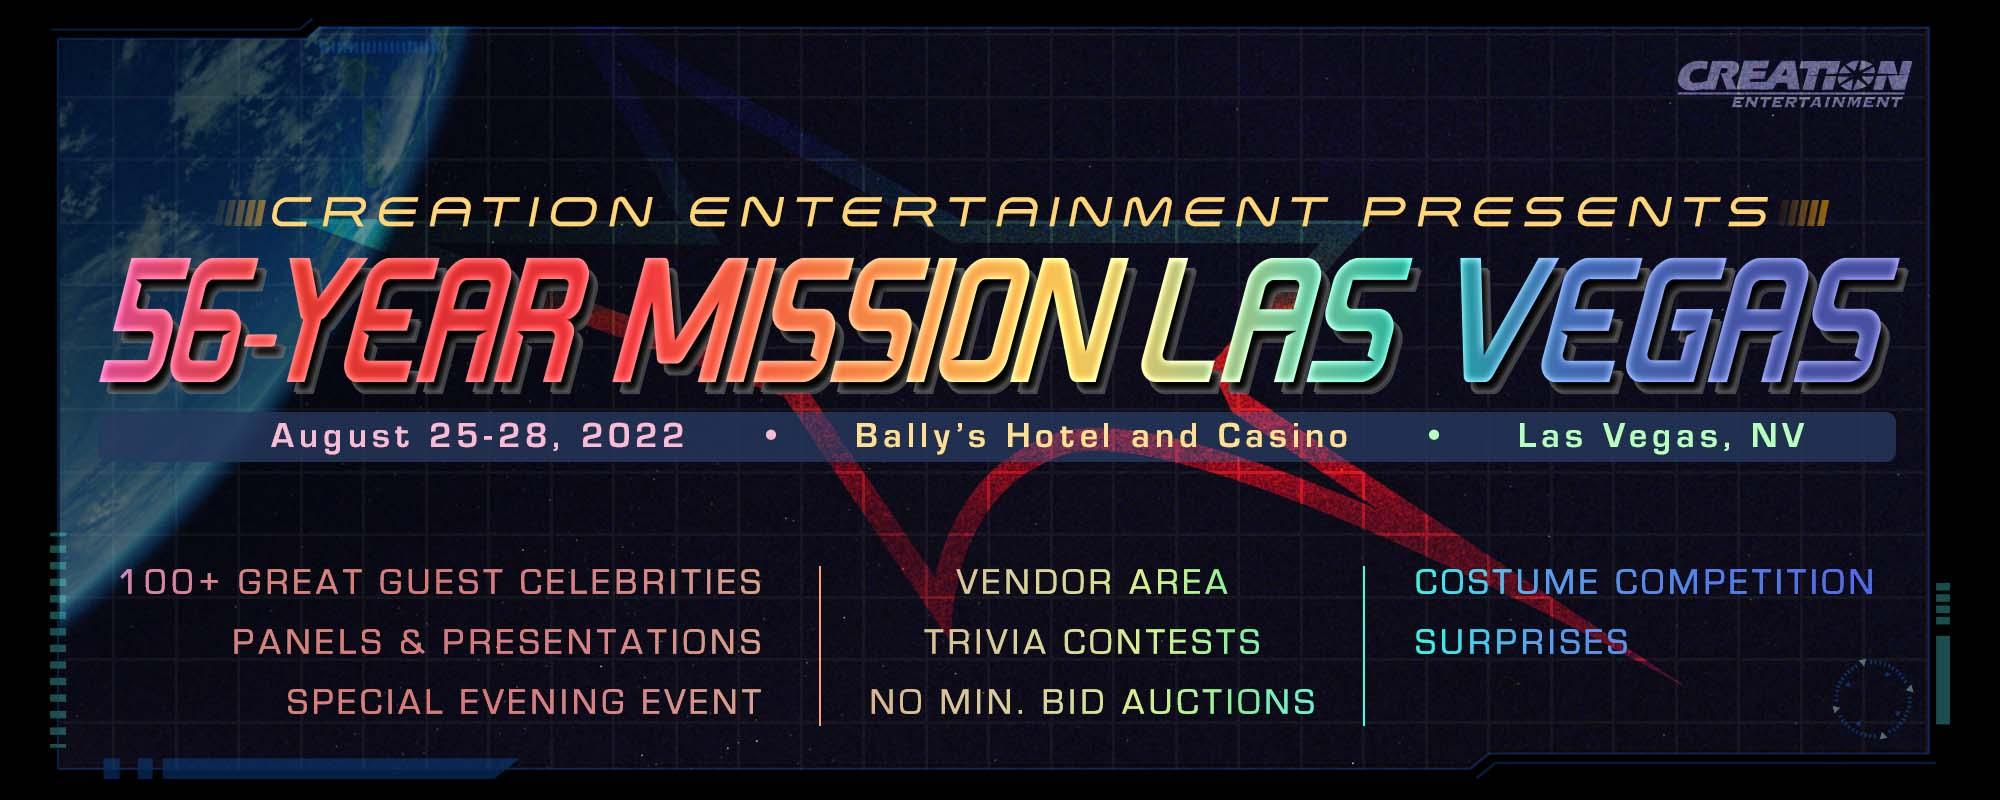 Creation Entertainment Trek Conventions